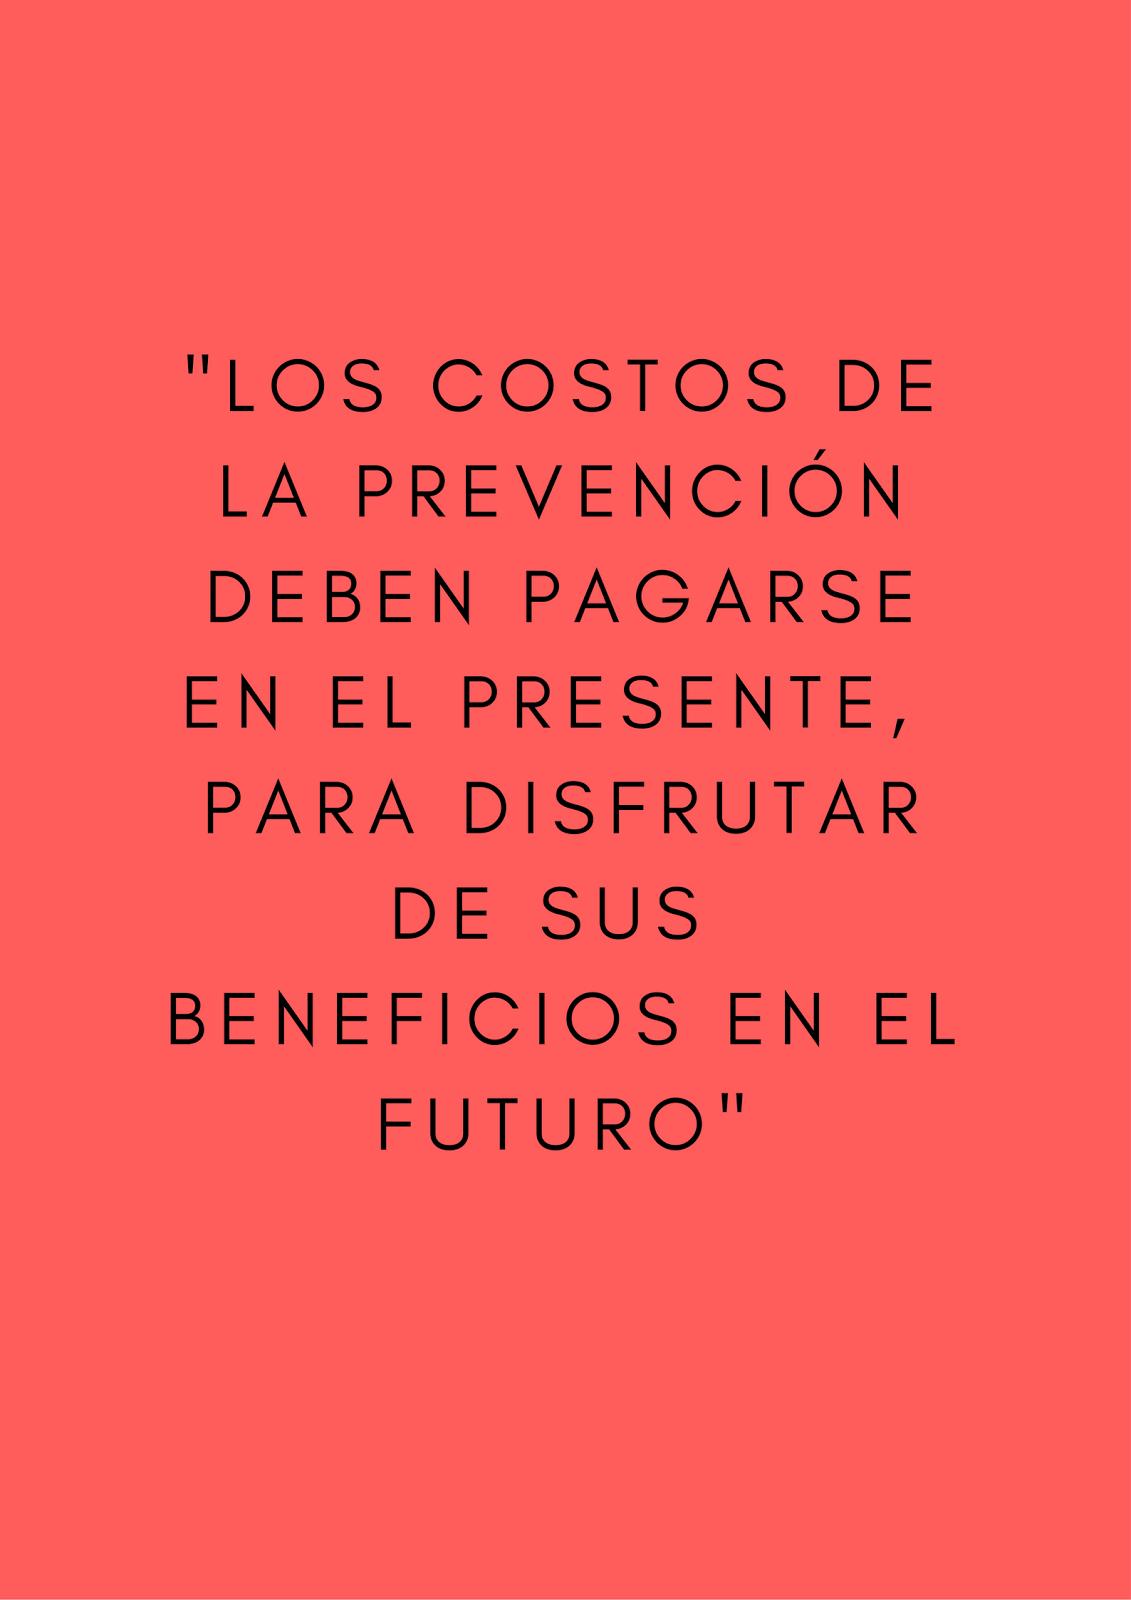 Invertir en prevención